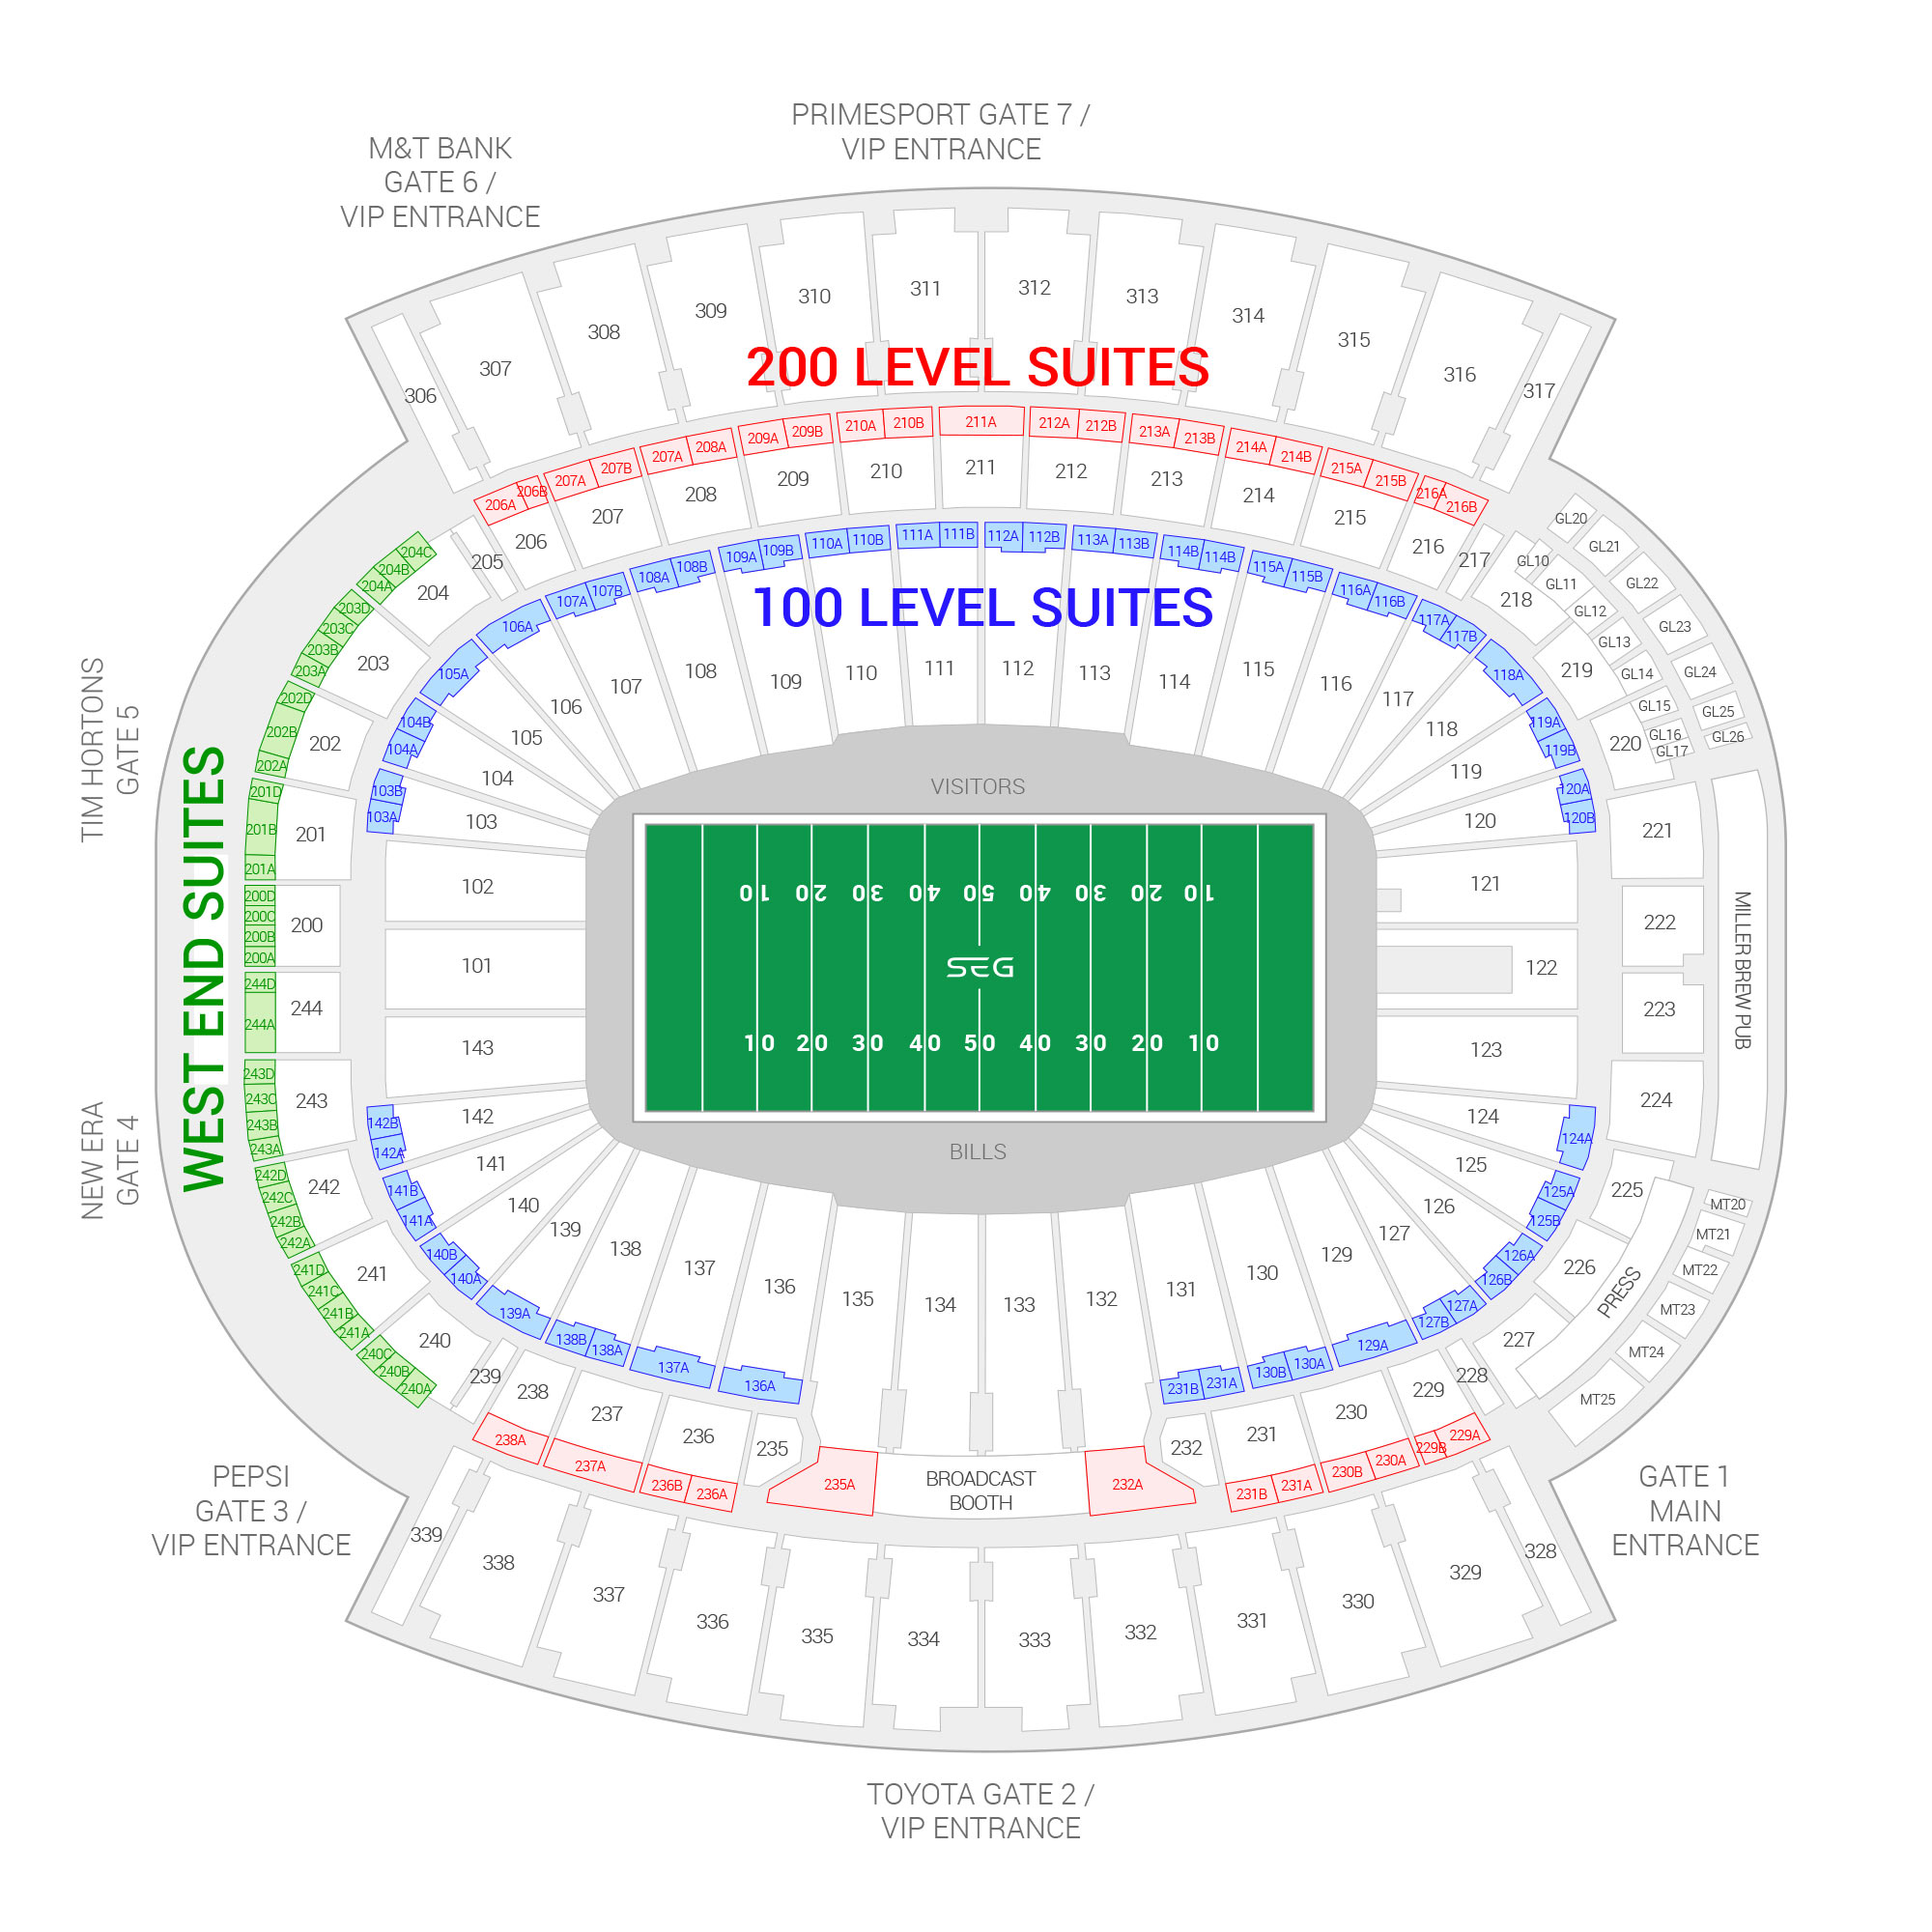 Highmark Stadium (Formerly New Era Field) / Buffalo Bills Suite Map and Seating Chart